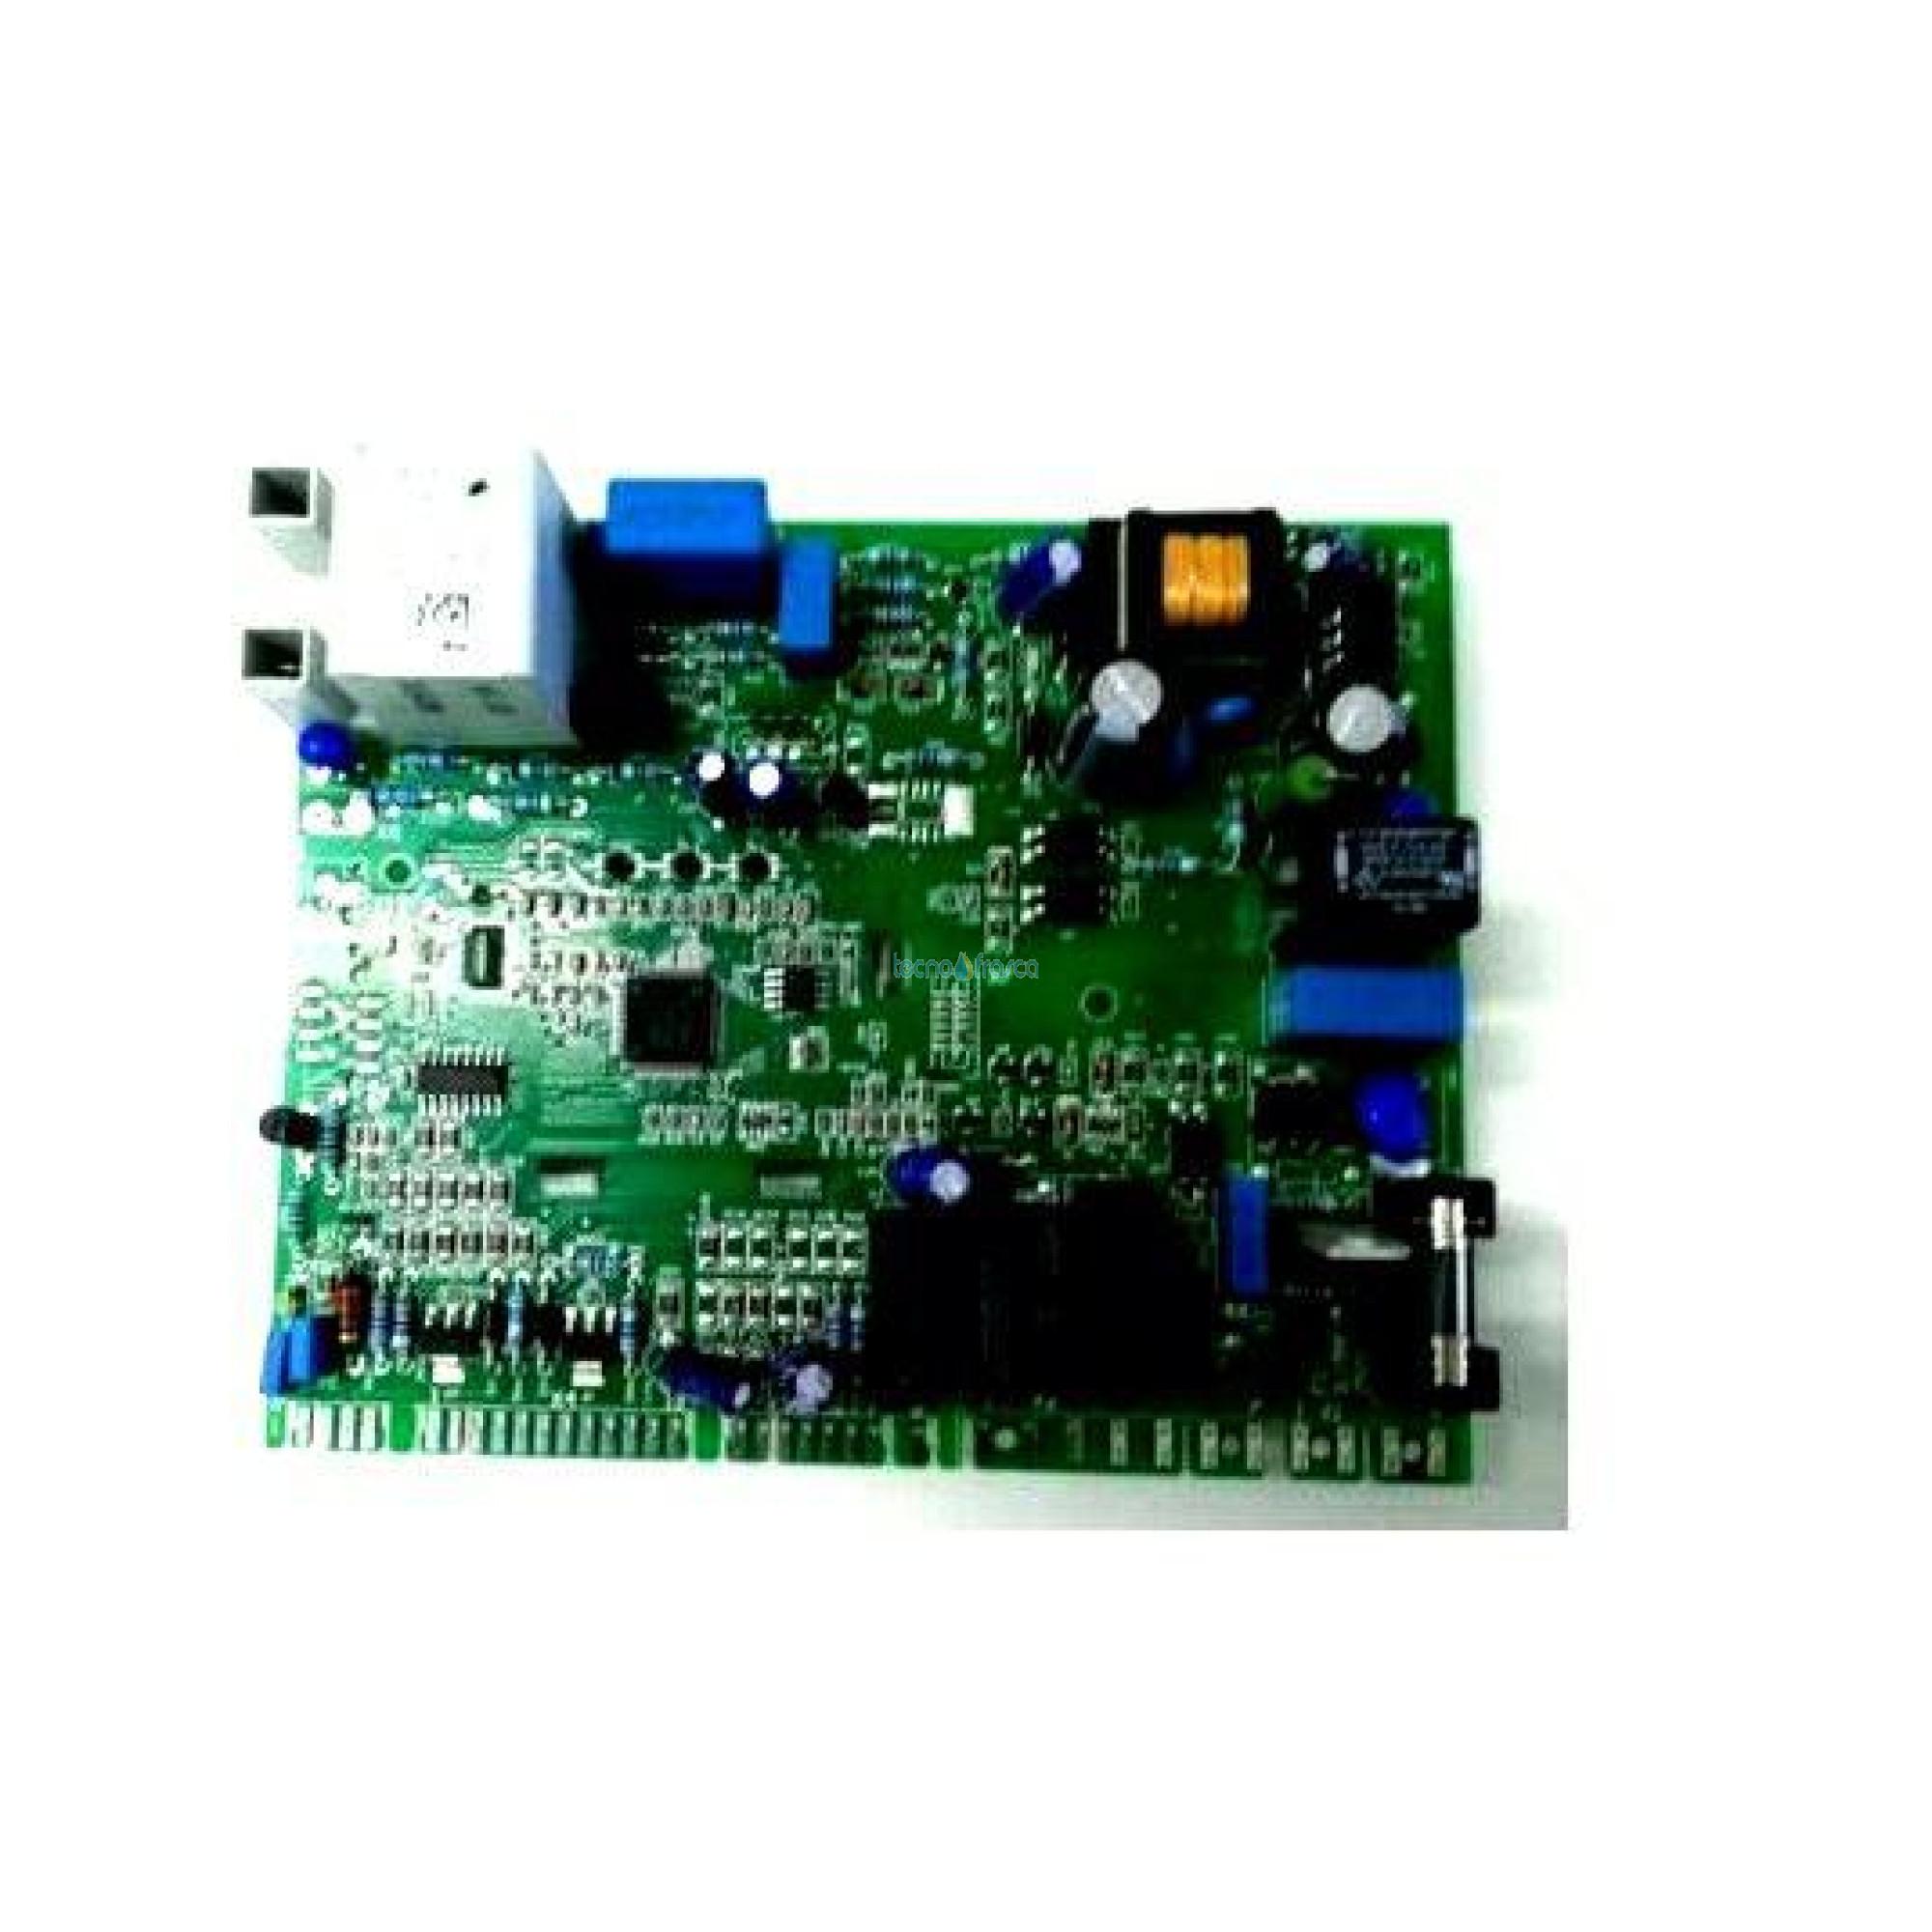 Savio biasi scheda integrata b&p m297 bi2285102